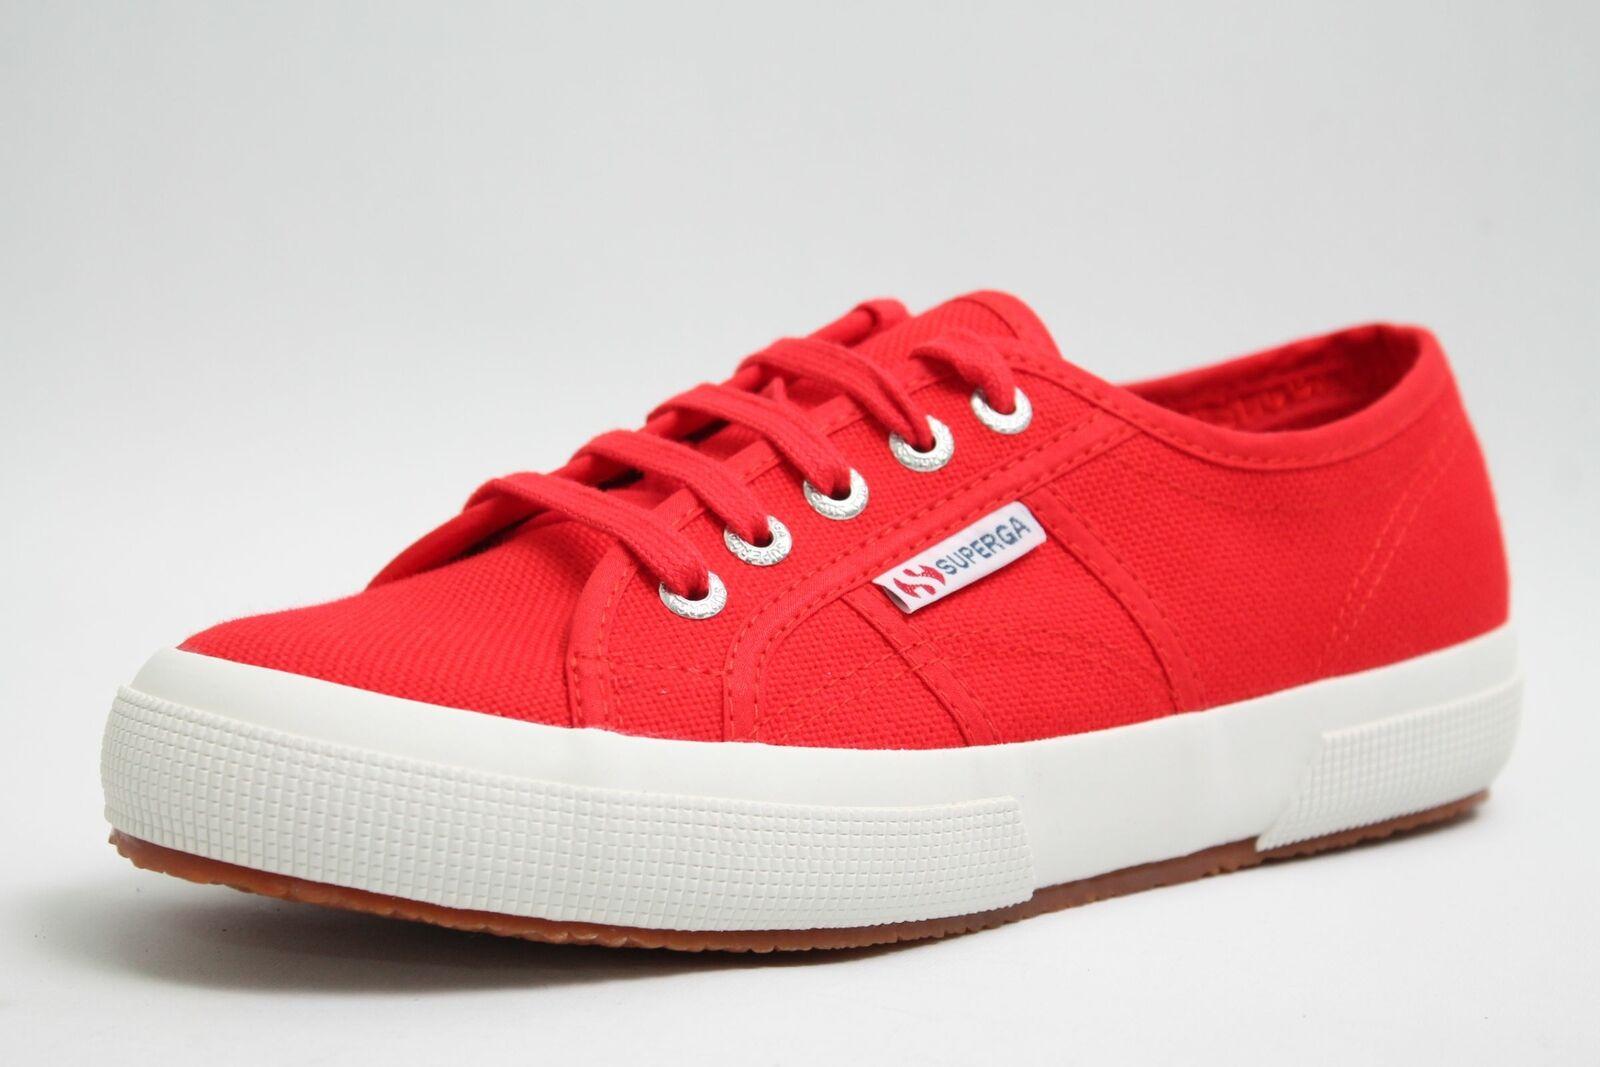 Superga Schuhe rot Textil Damen Turnschuhe